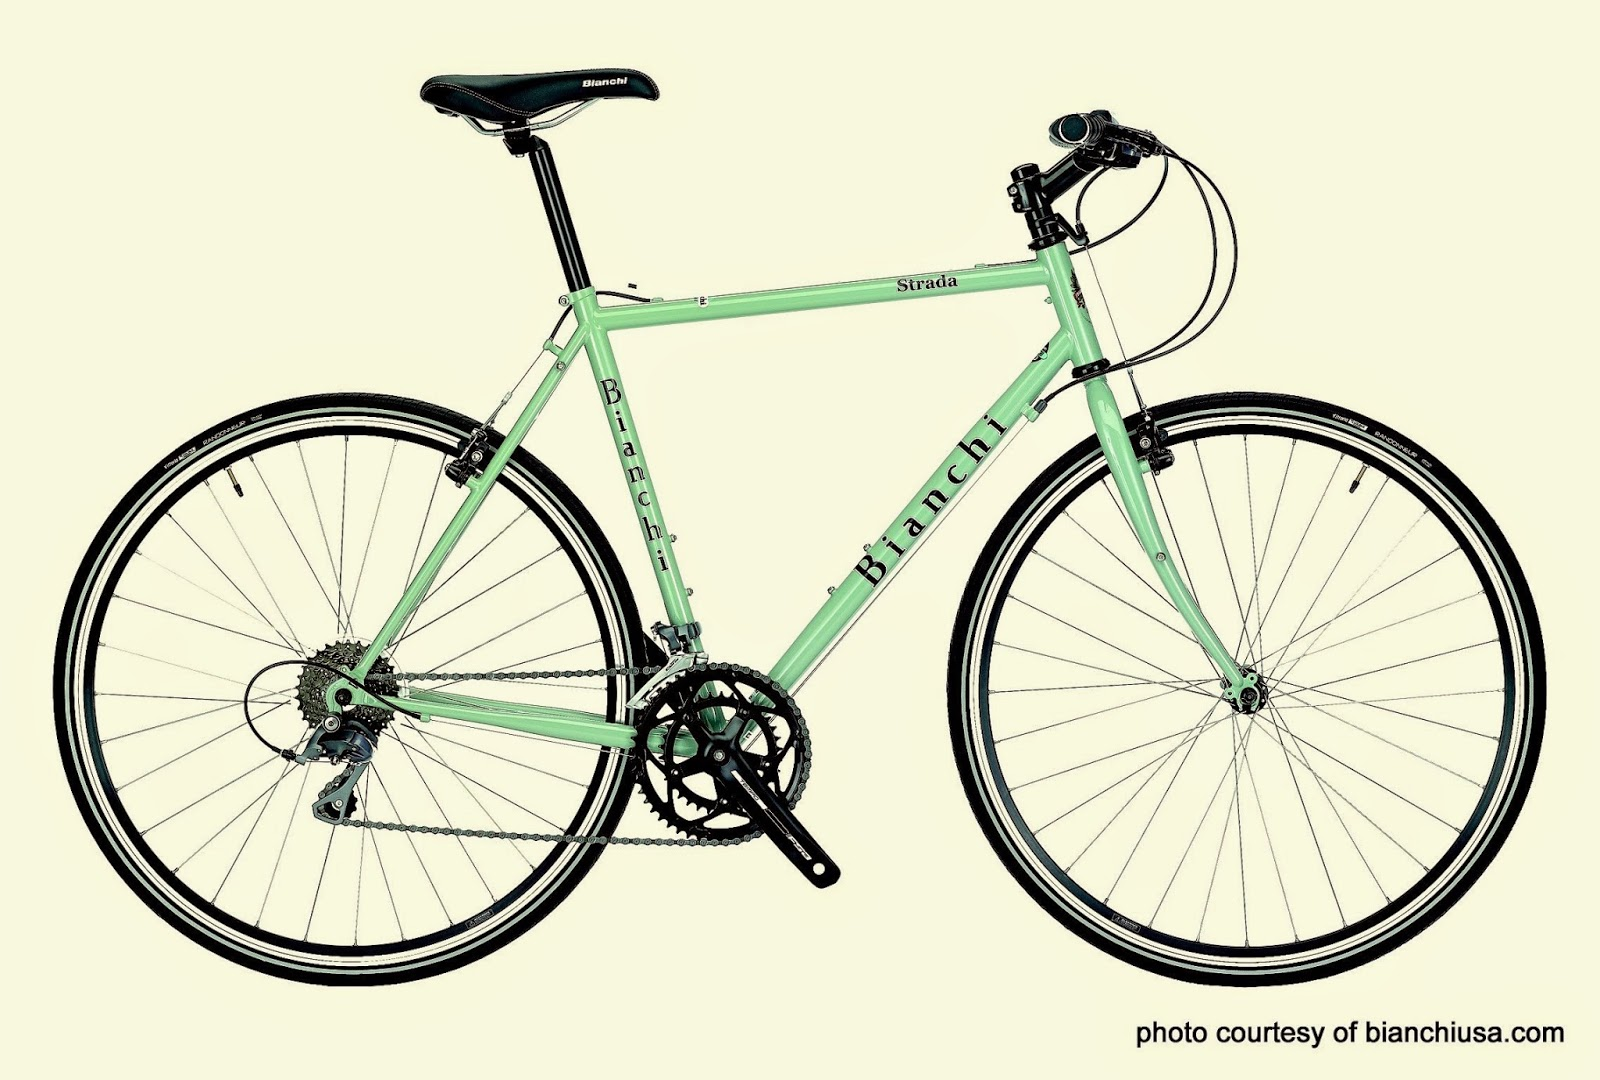 bianchi strada, commuter, gravel, cyclocross, touring, trekking, adventure